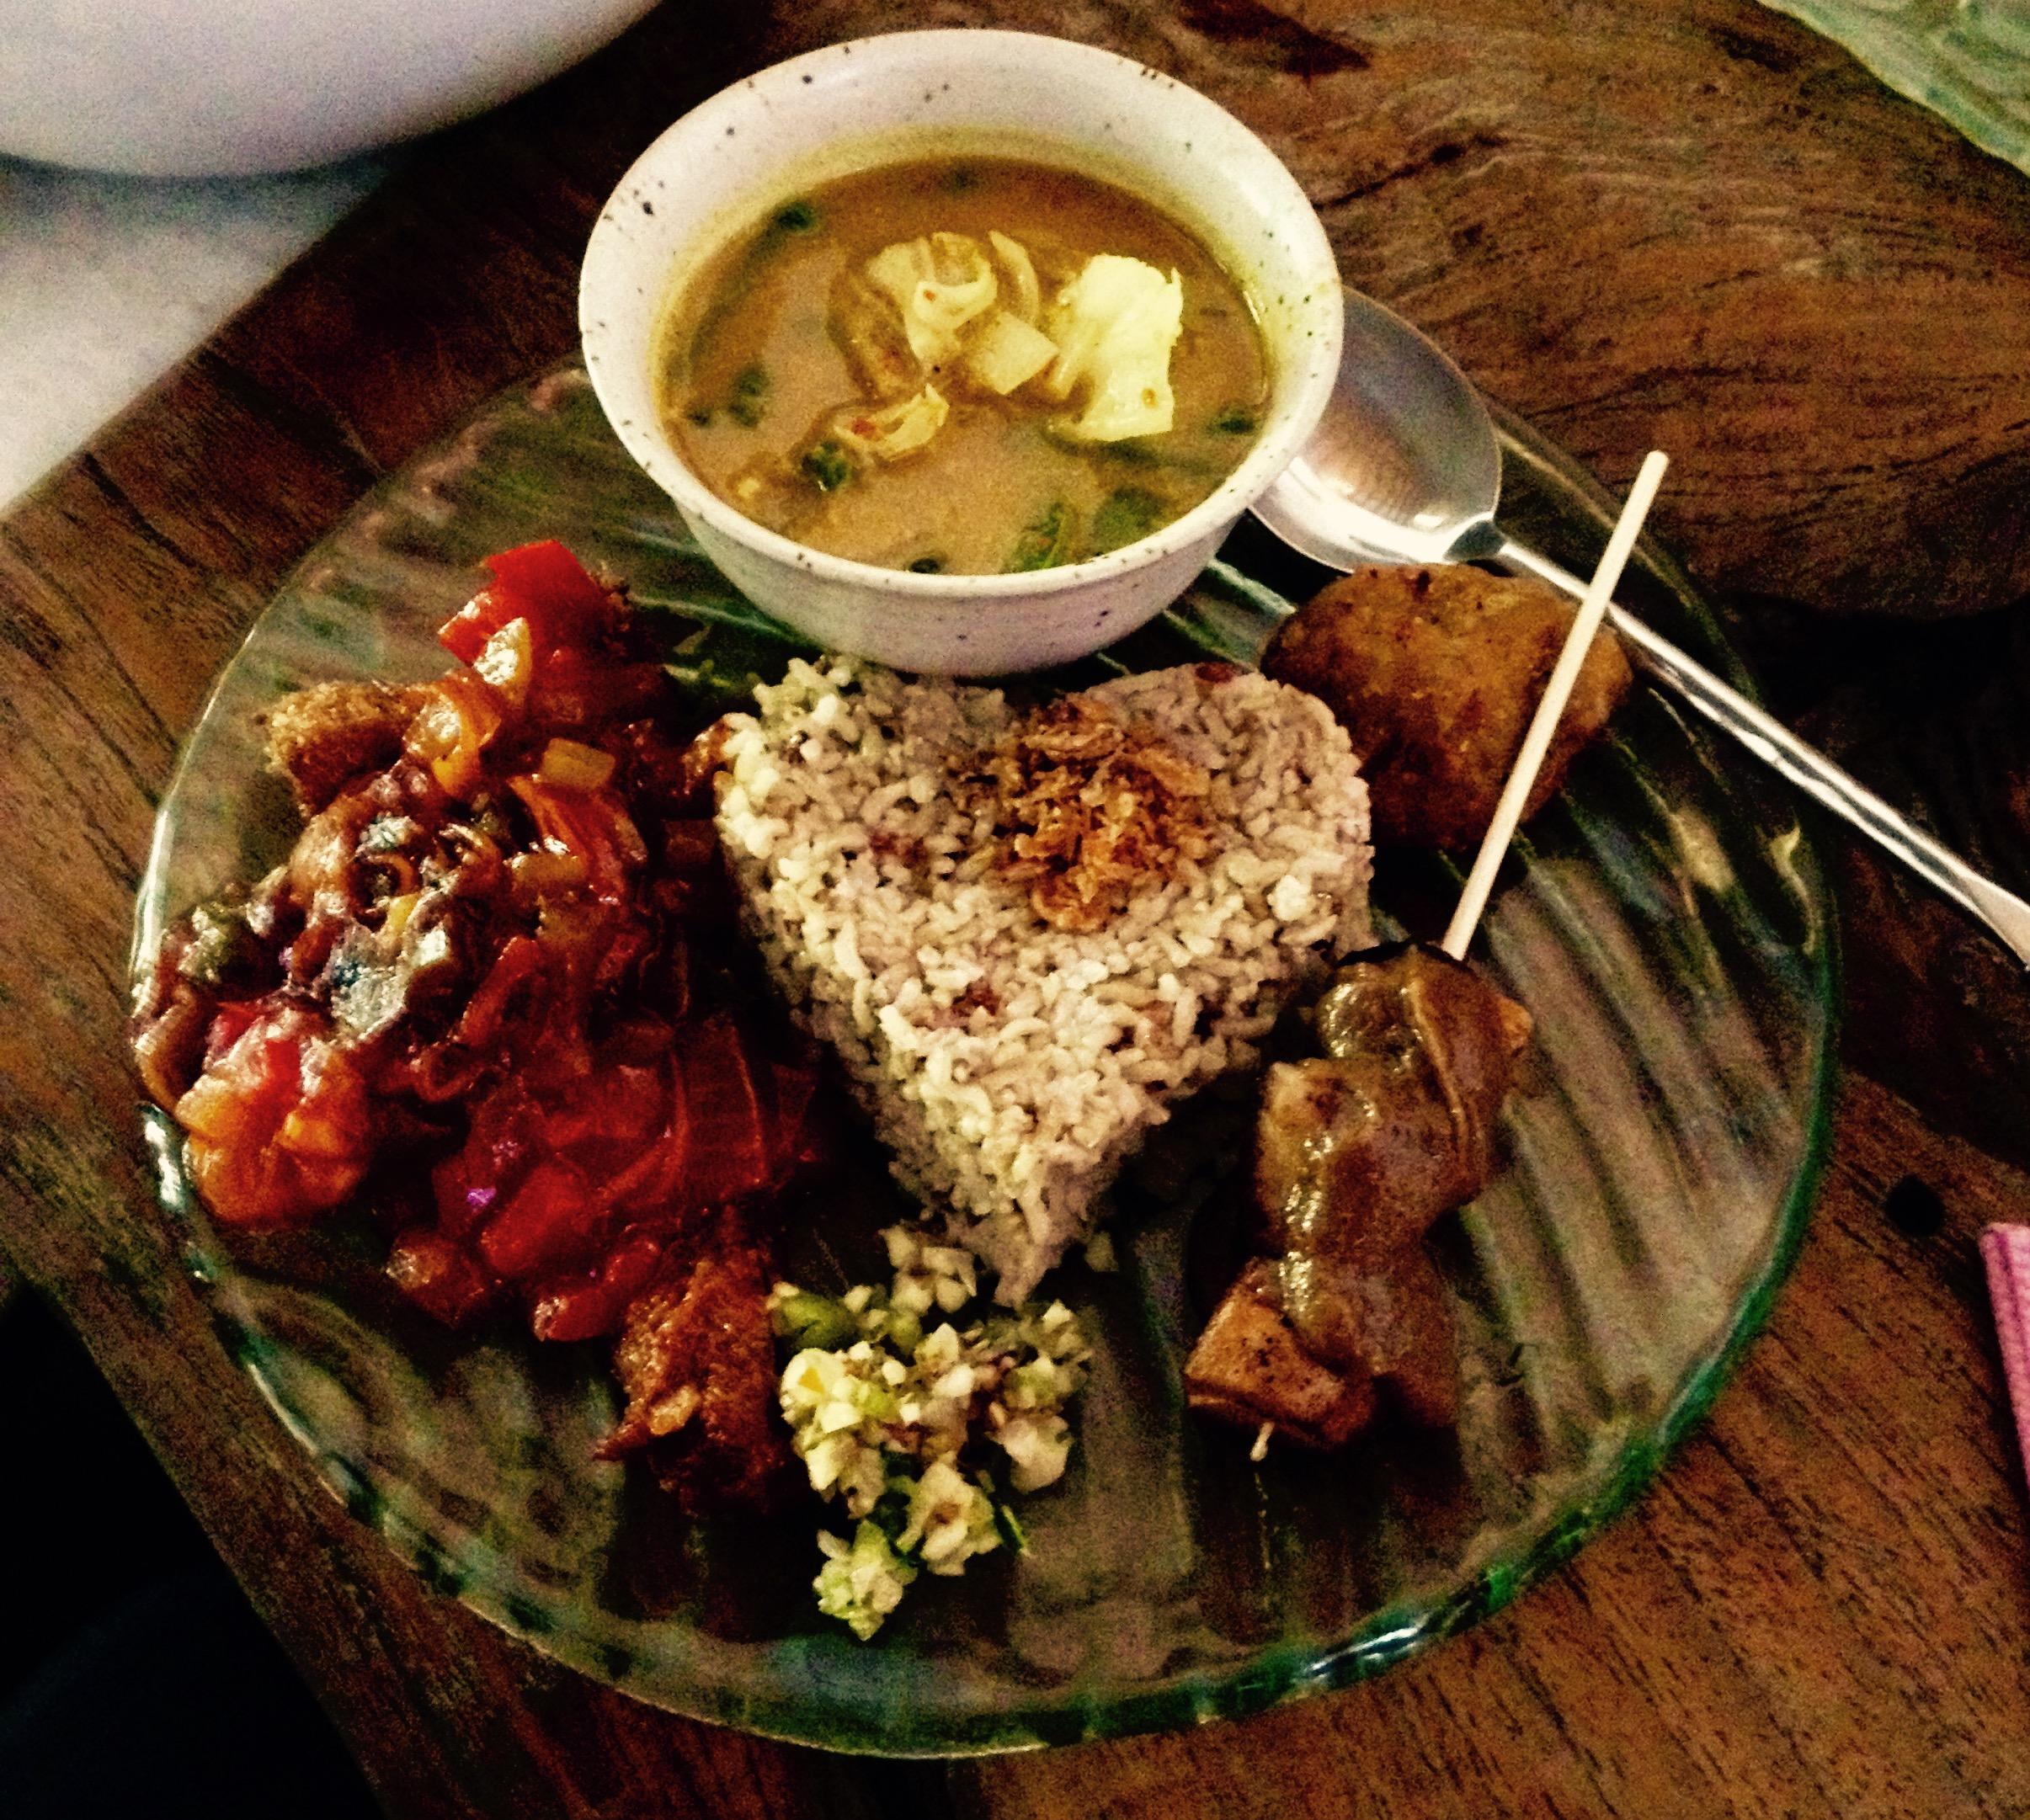 bali-heart-meal.jpg